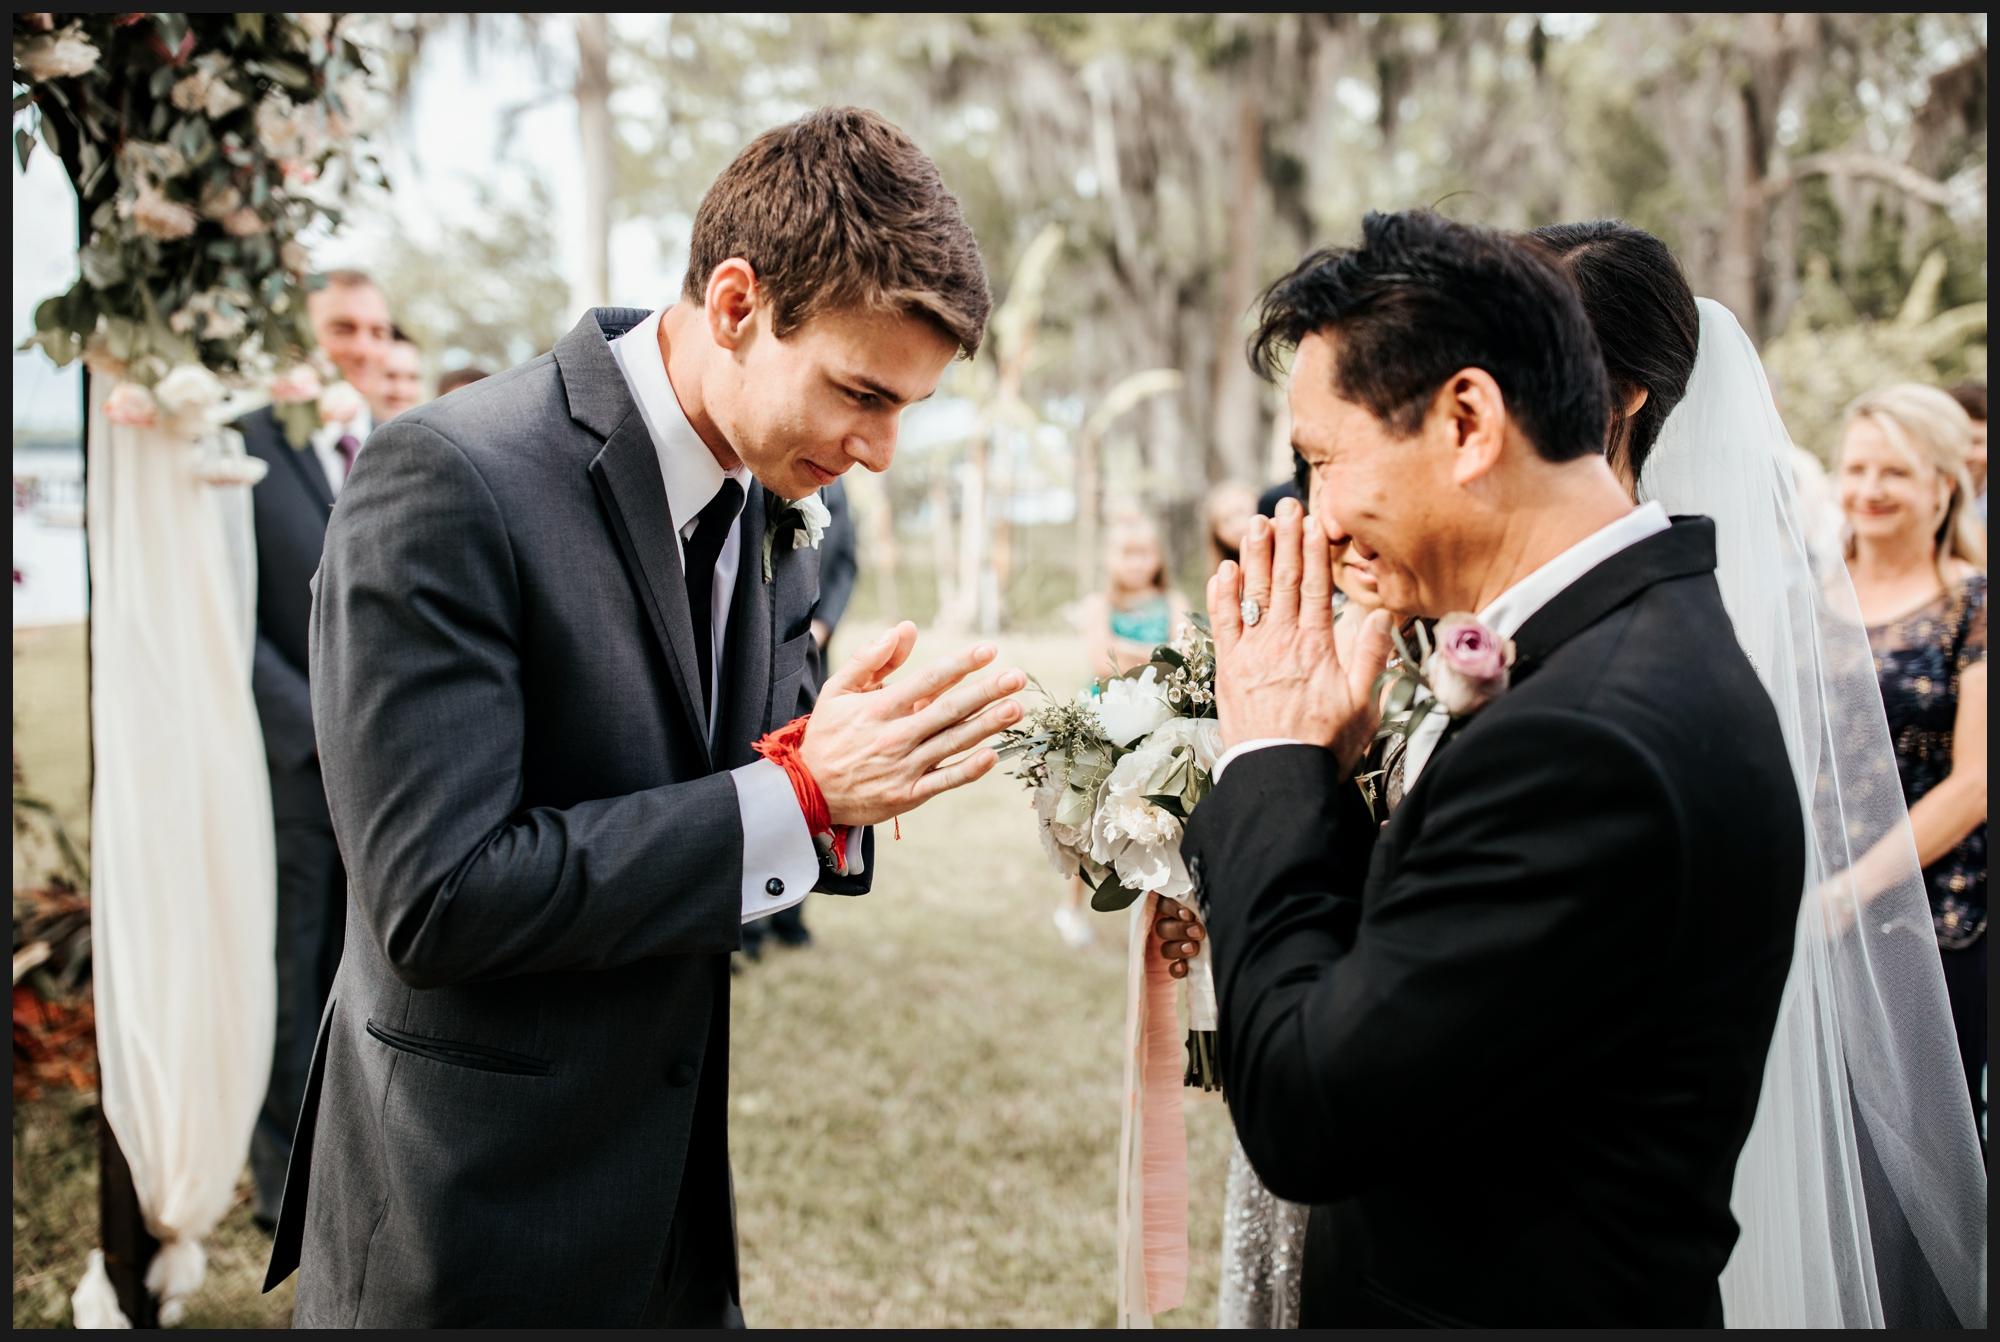 Orlando-Wedding-Photographer-destination-wedding-photographer-florida-wedding-photographer-bohemian-wedding-photographer_1423.jpg